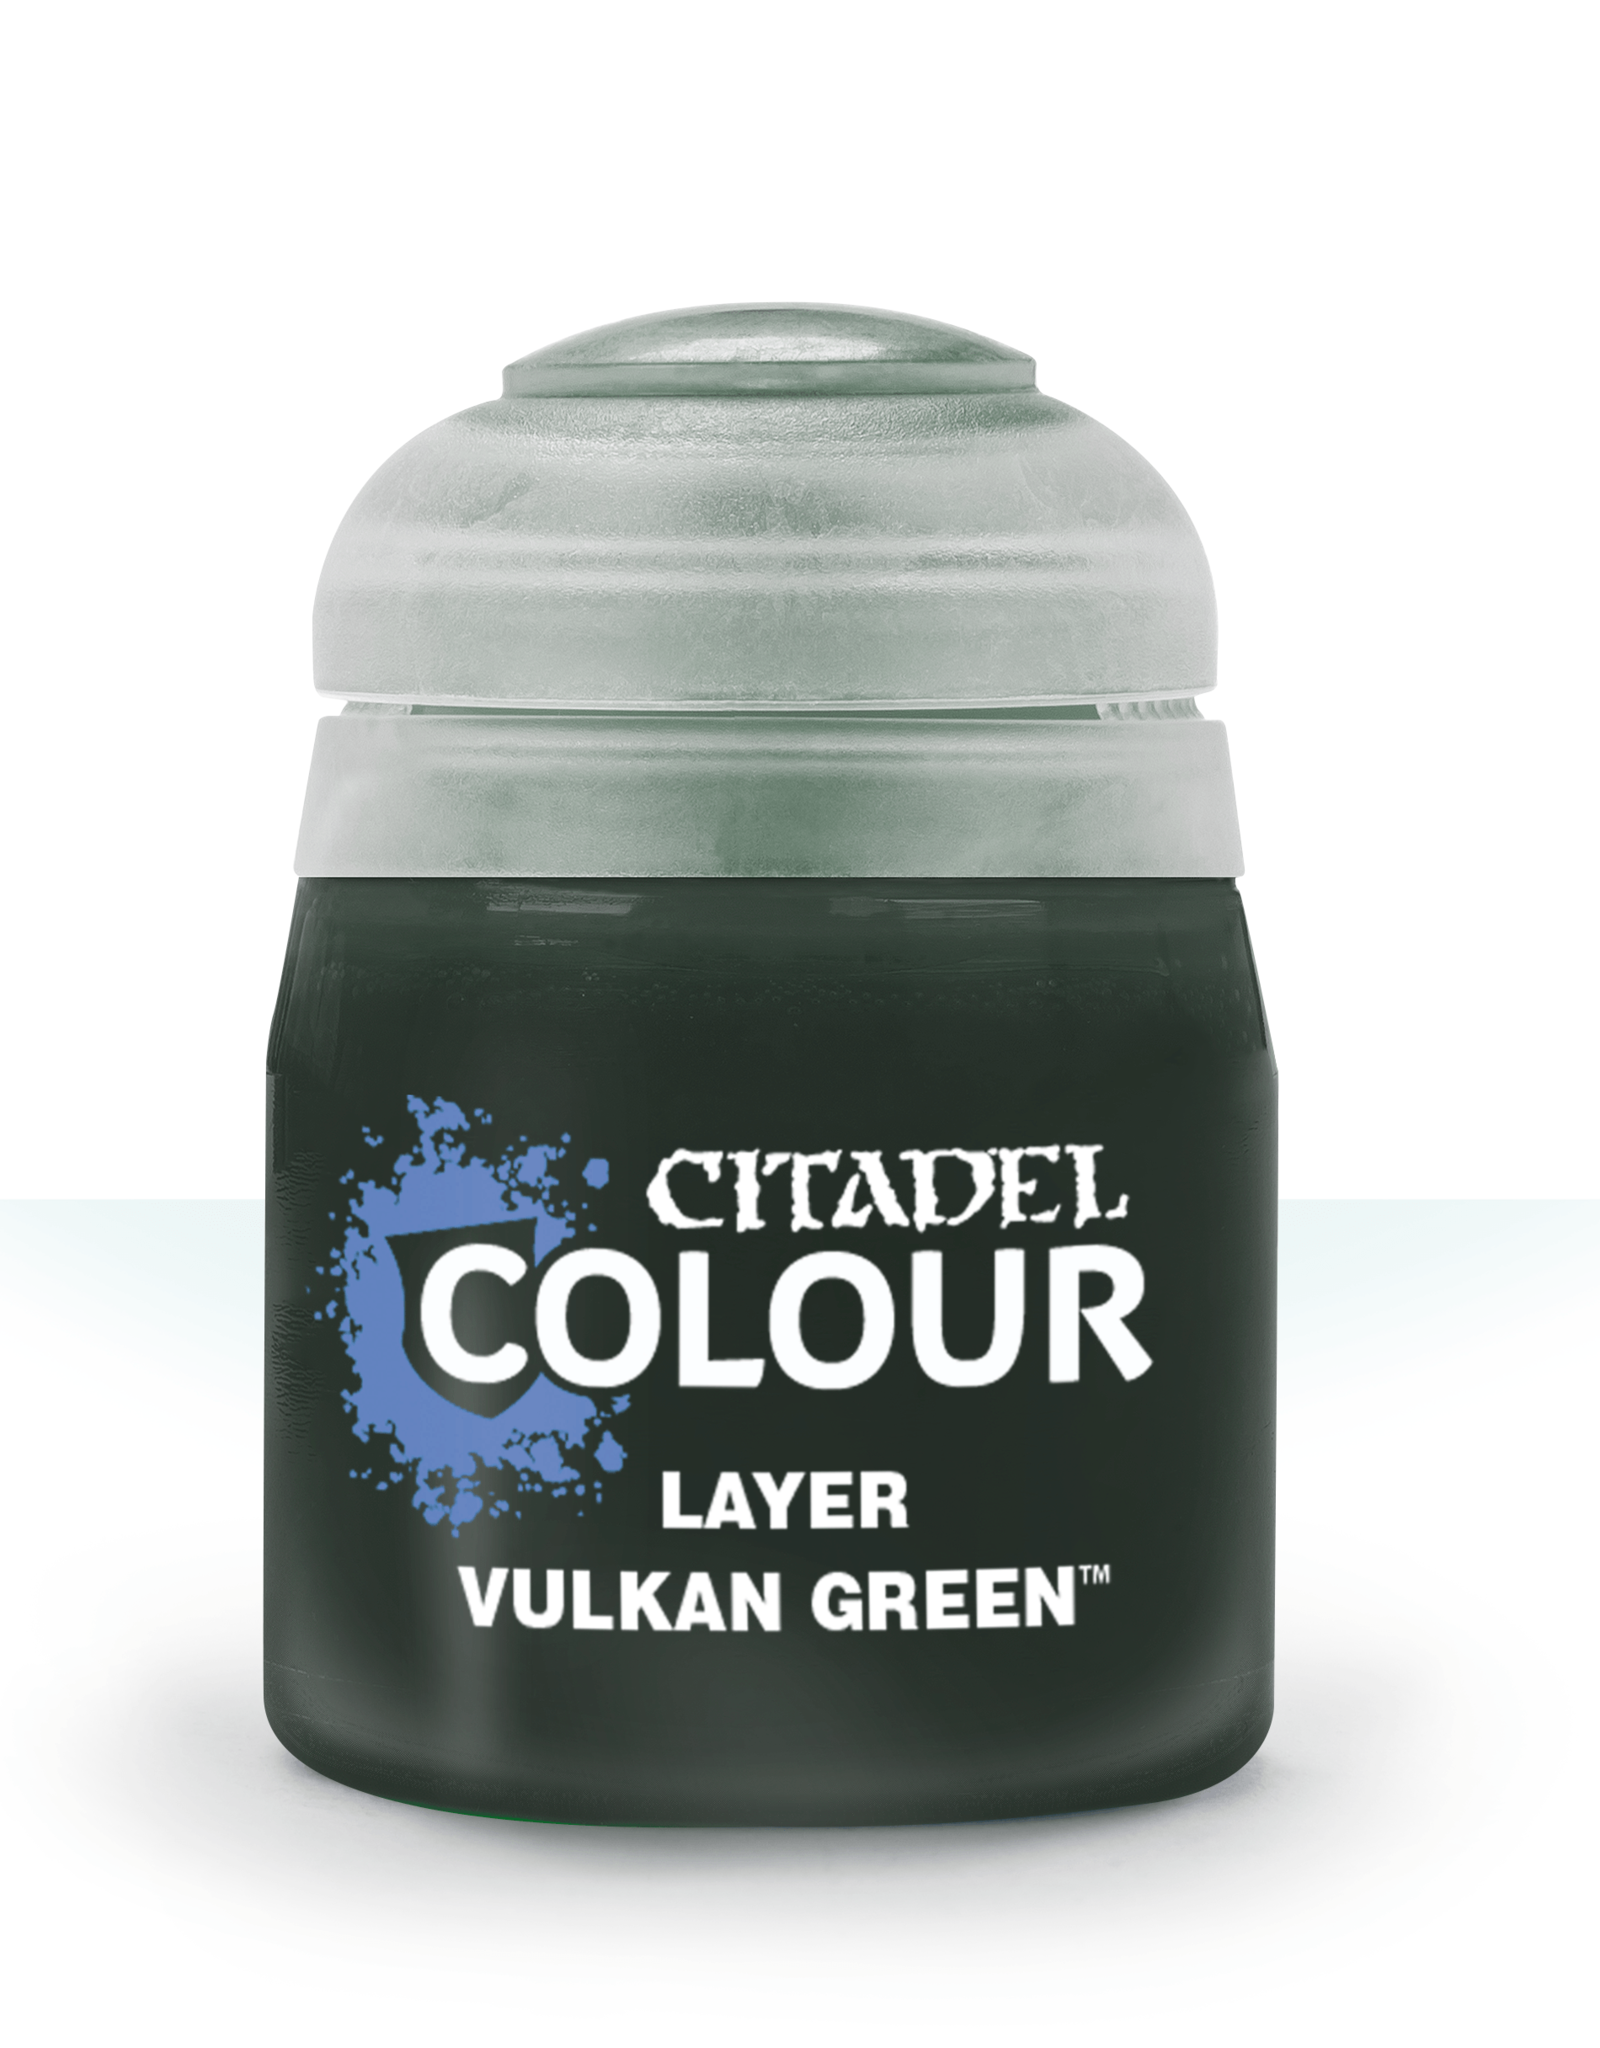 Citadel Citadel Layer: Vulkan Green (12ml)